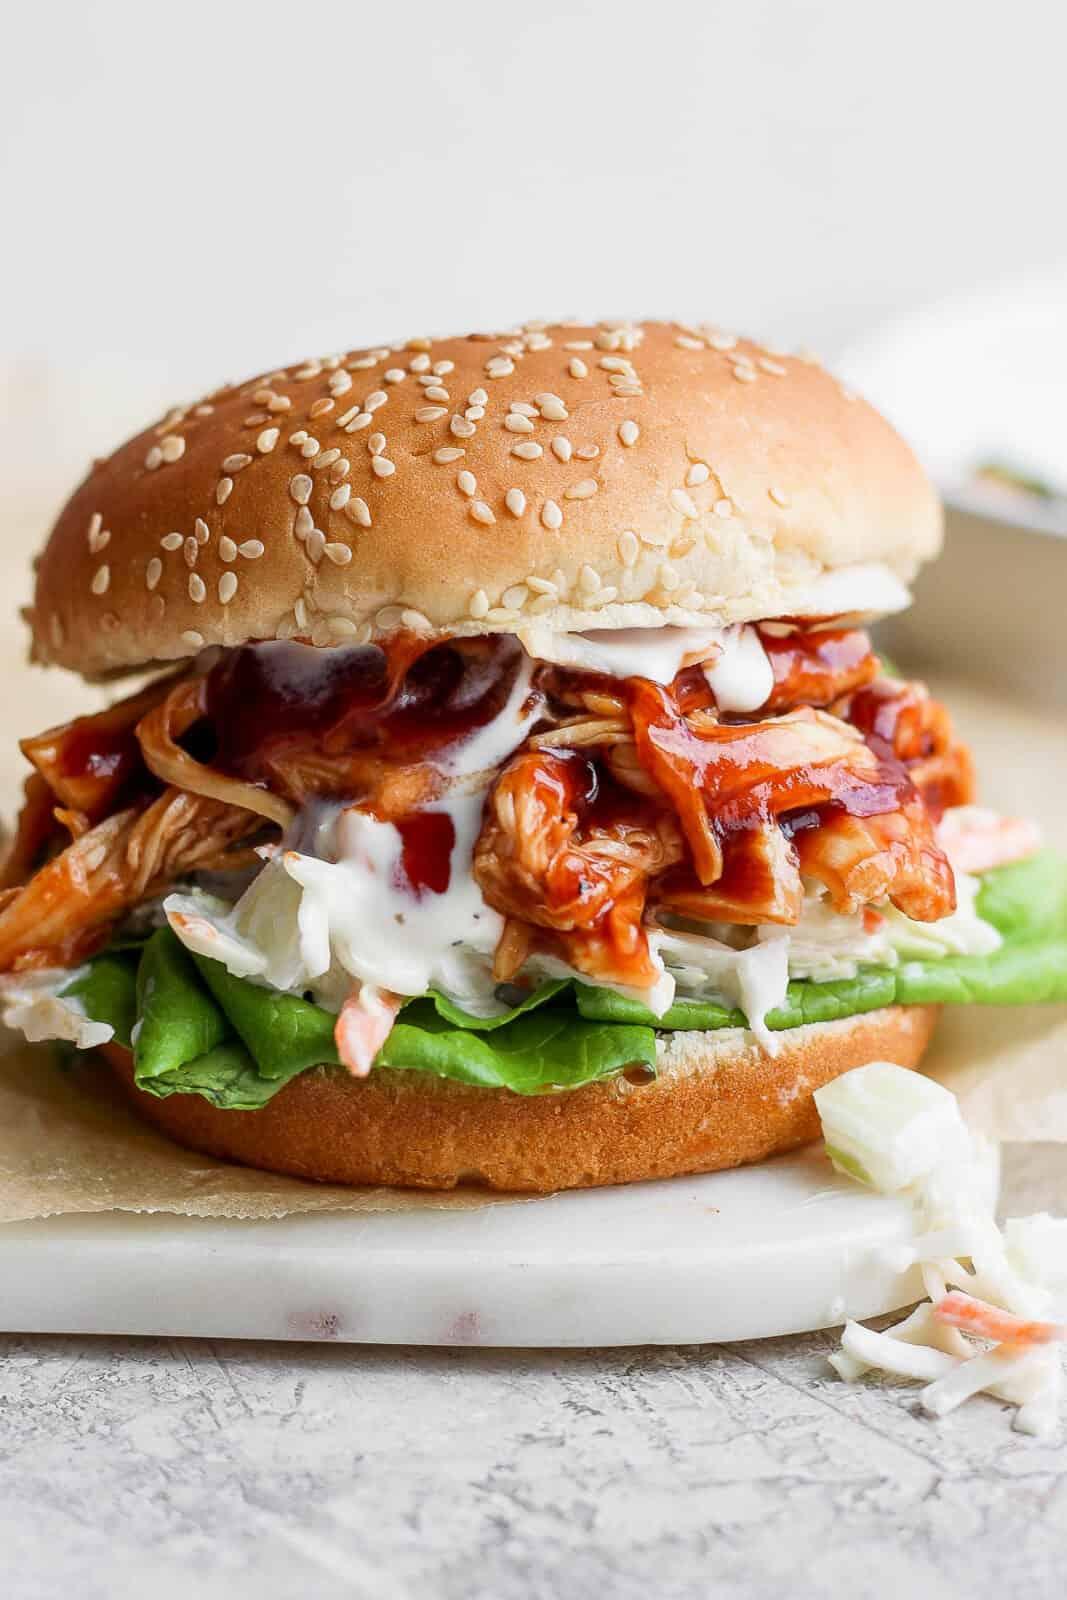 A BBQ chicken sandwich on a plate.